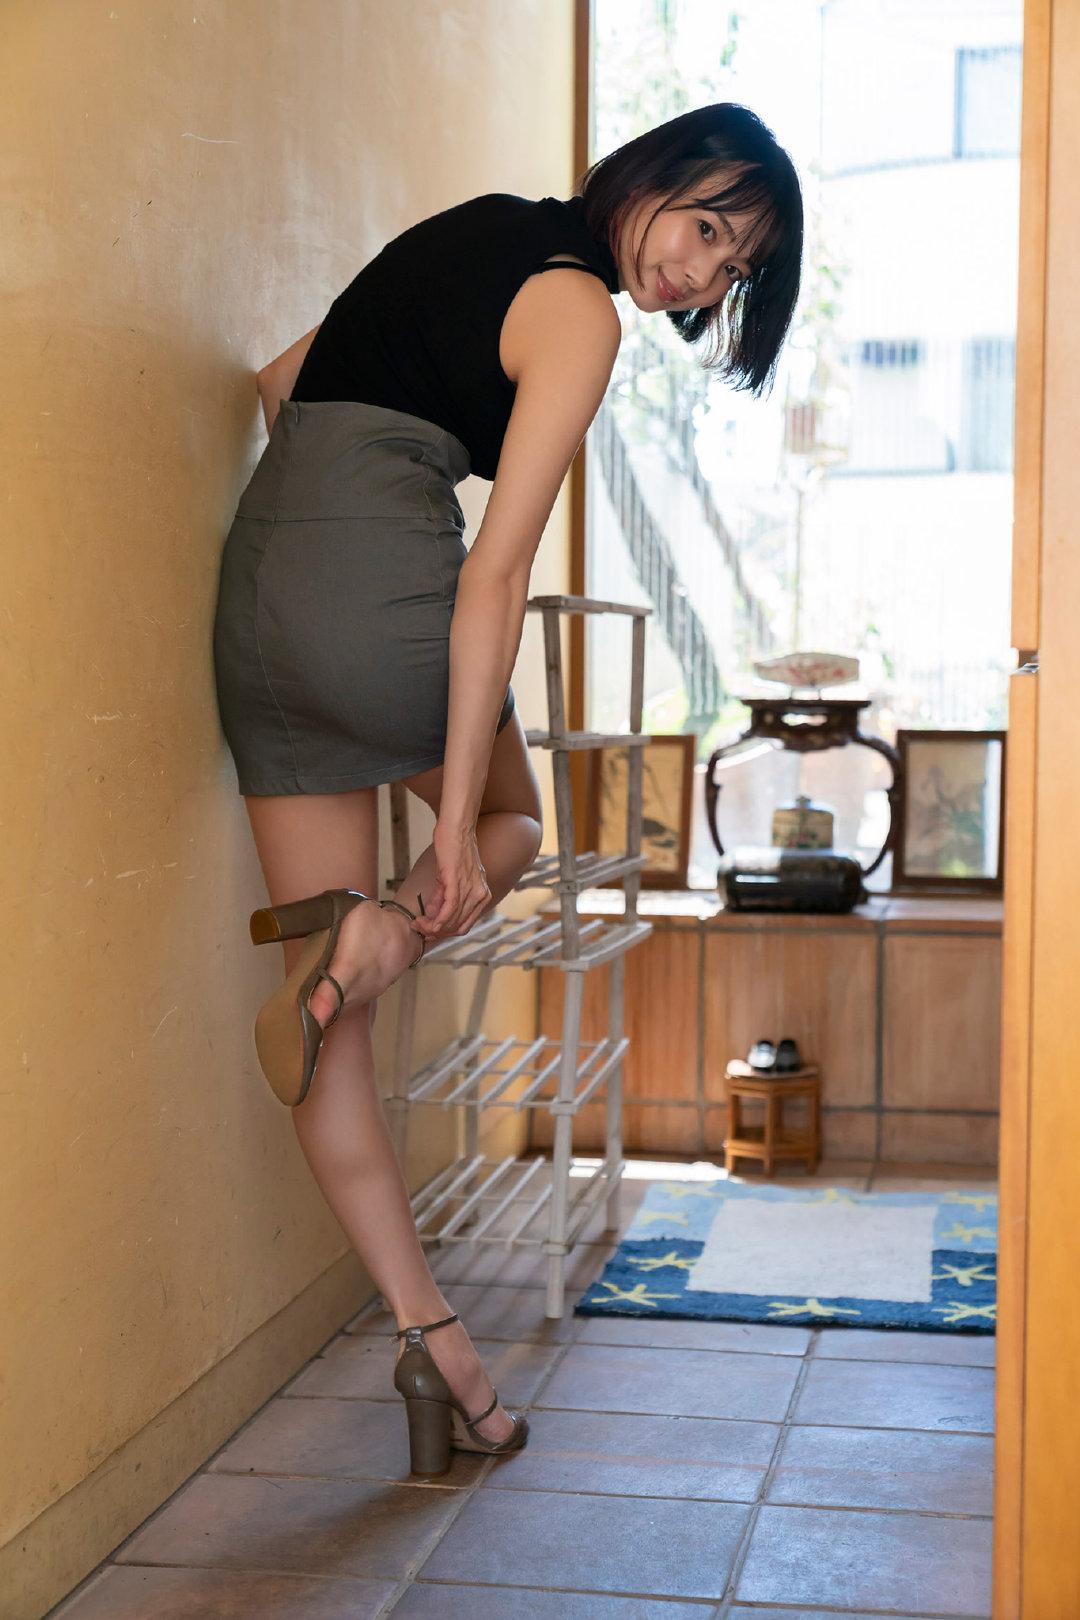 和岡田紗佳过着梦幻般的同居生活!週刊ポストデジタル写真集插图4